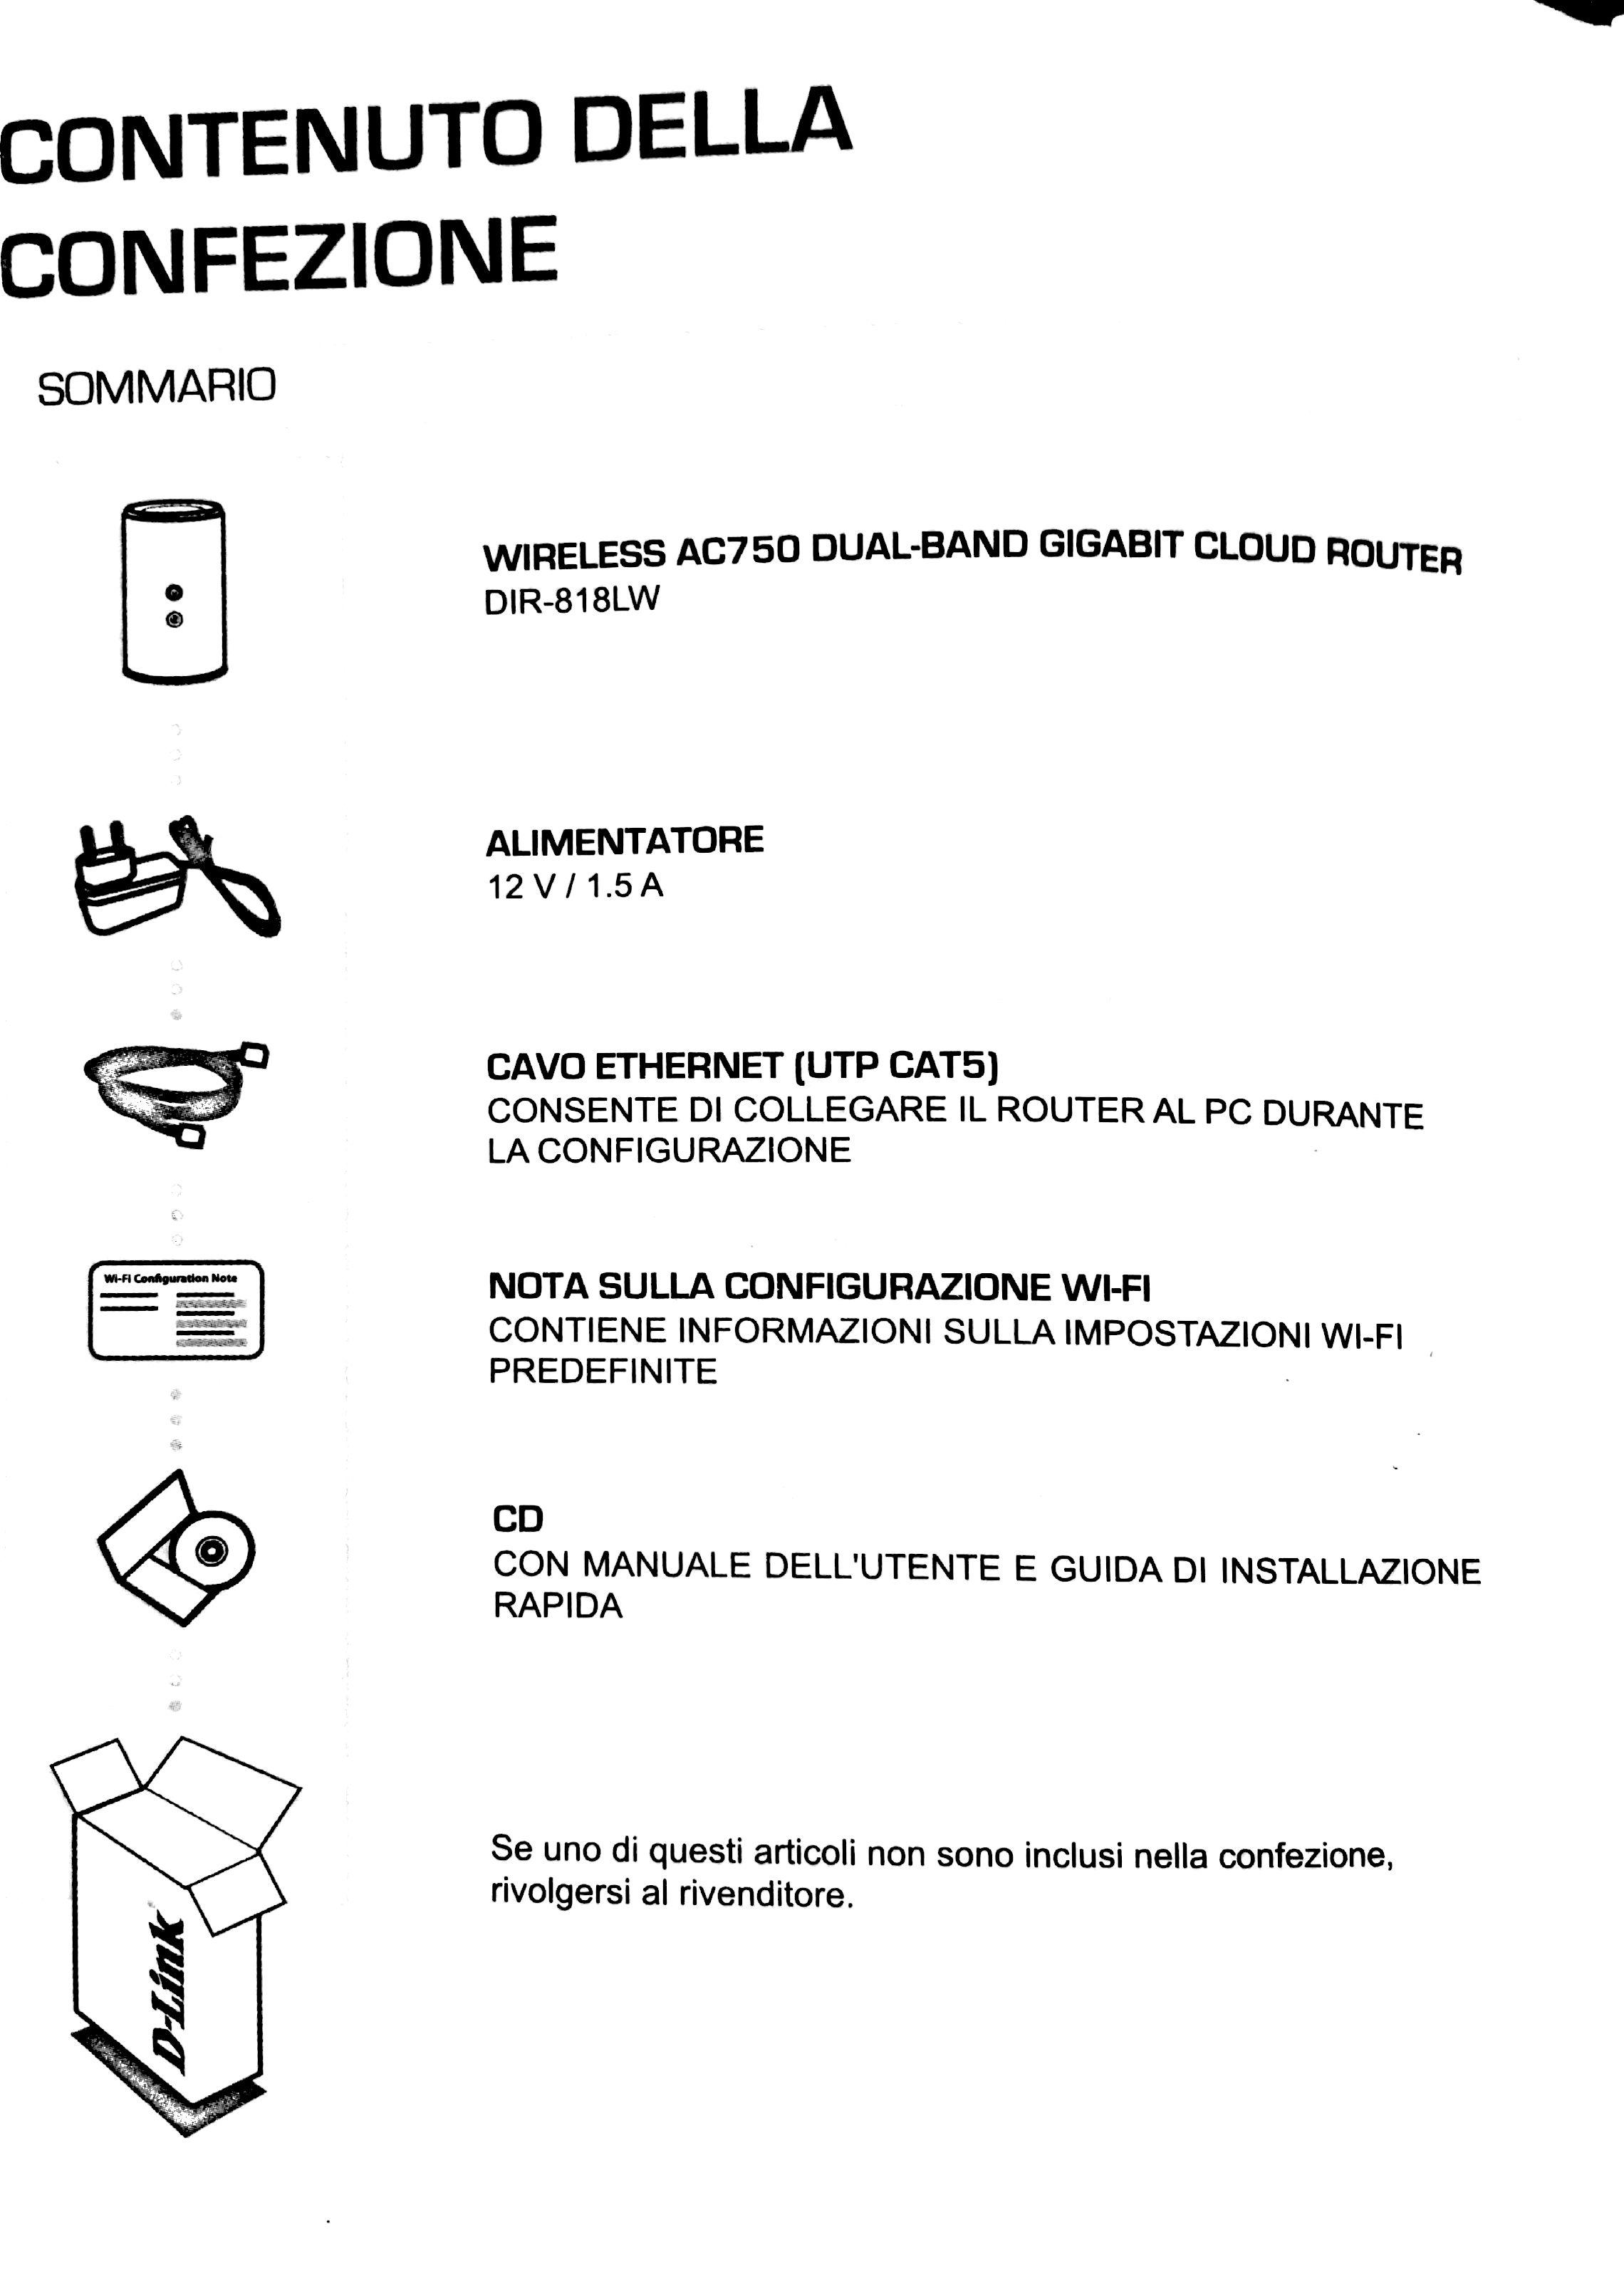 Nuovo documento 2_2